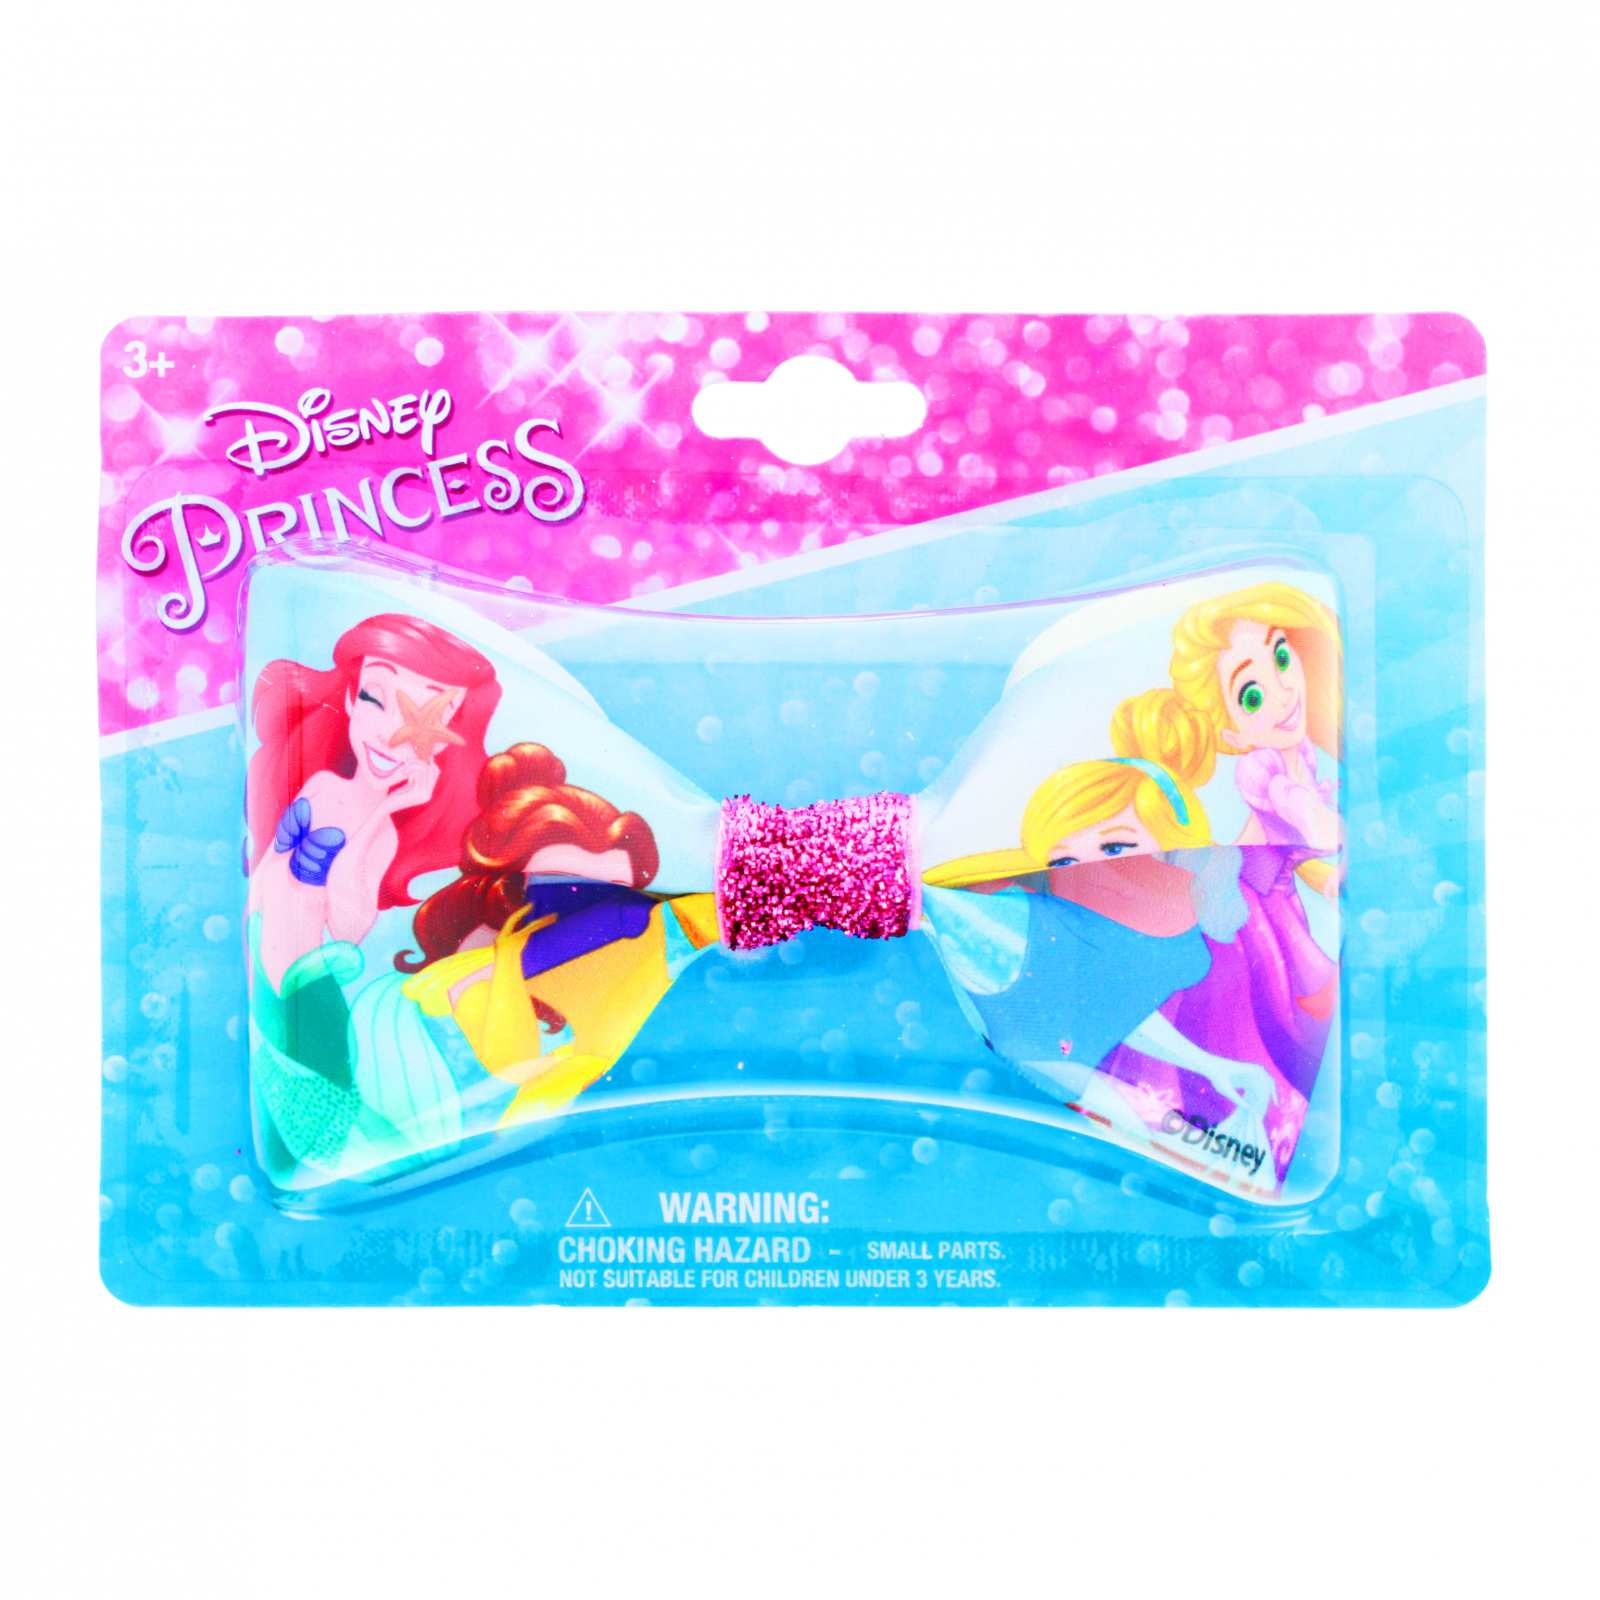 Disney Princess Girls Hair Bow Clip with Sparkle Center